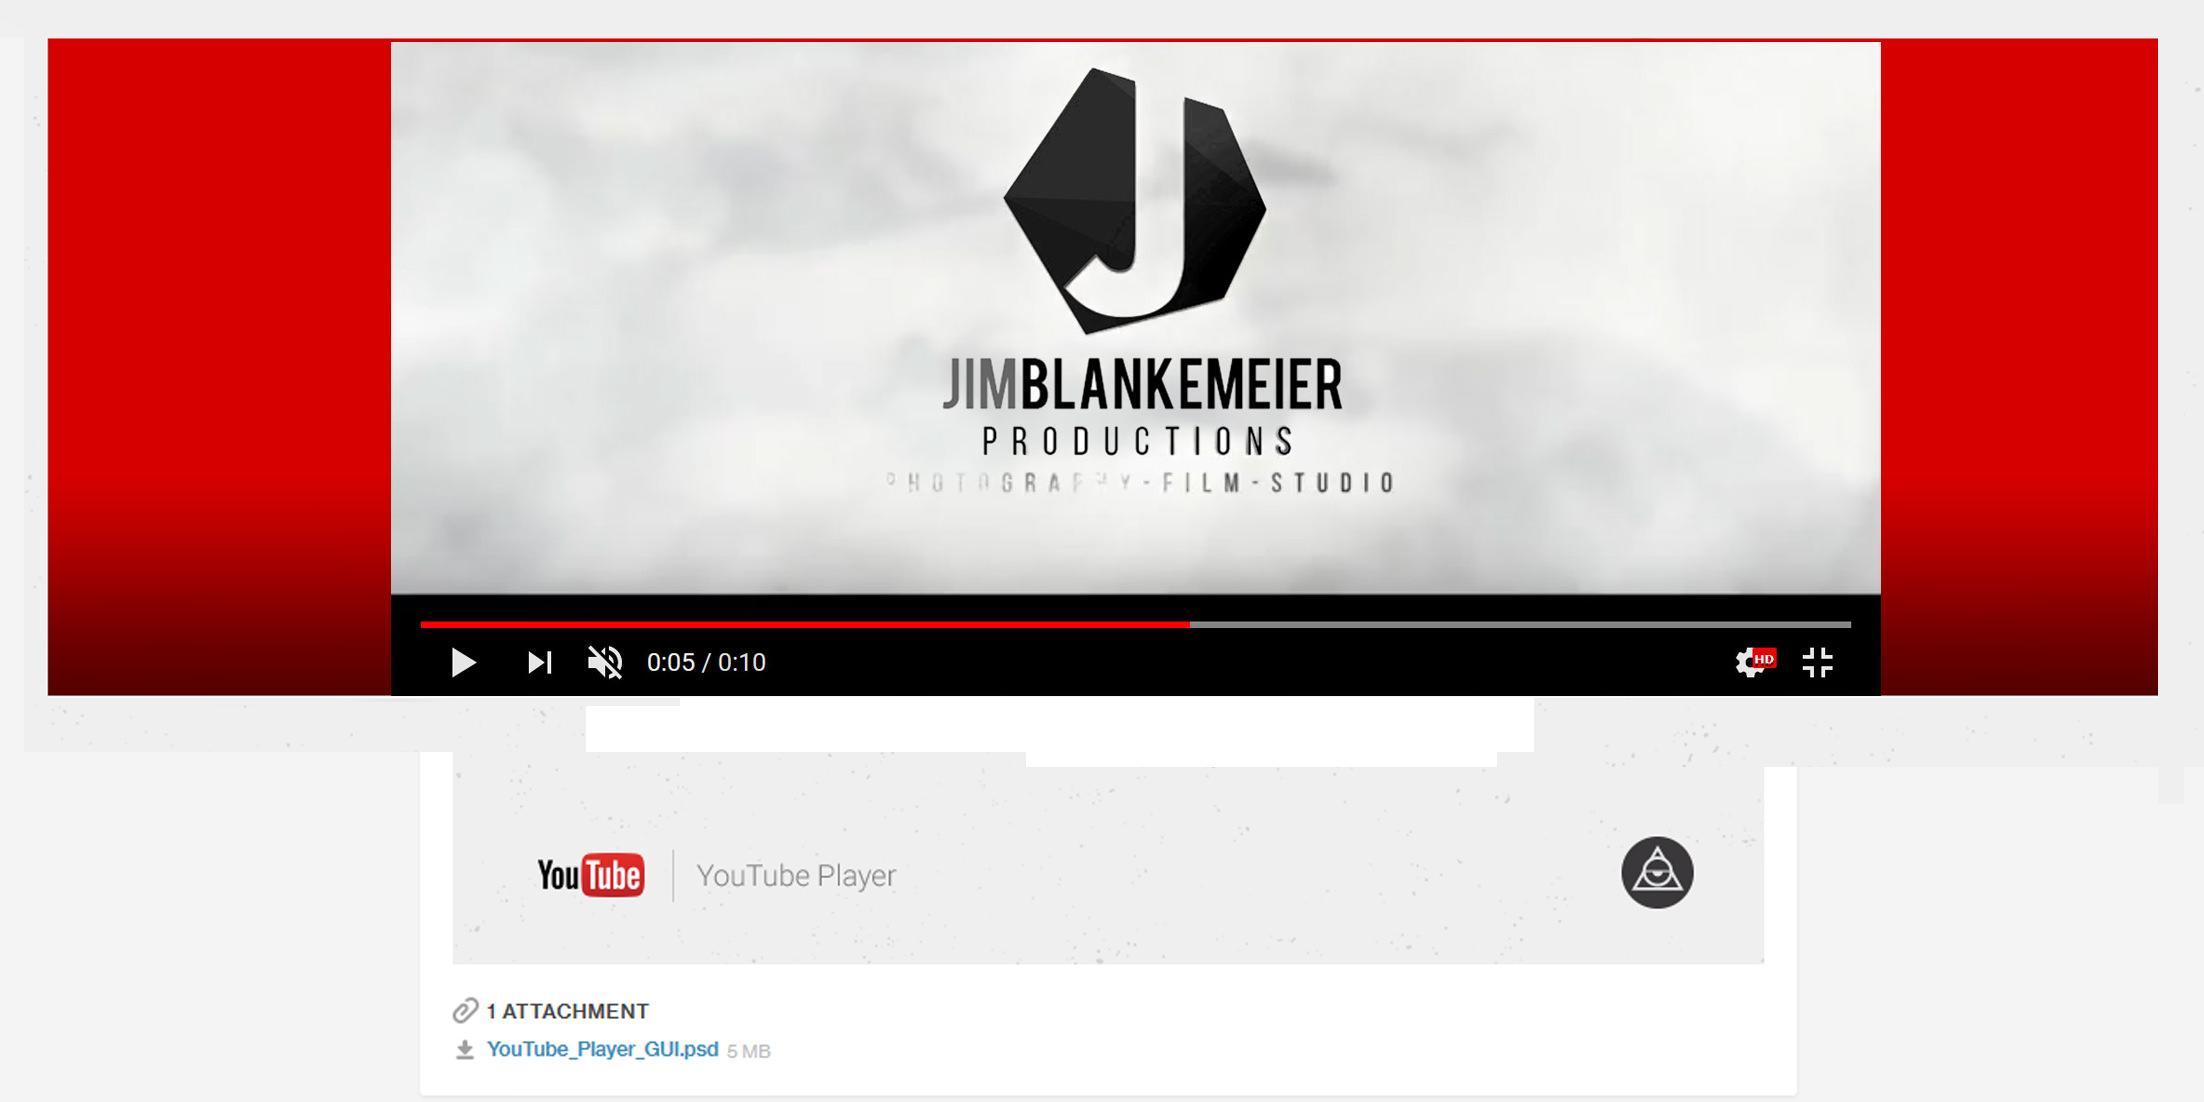 Video productions by Jim Blankemeier